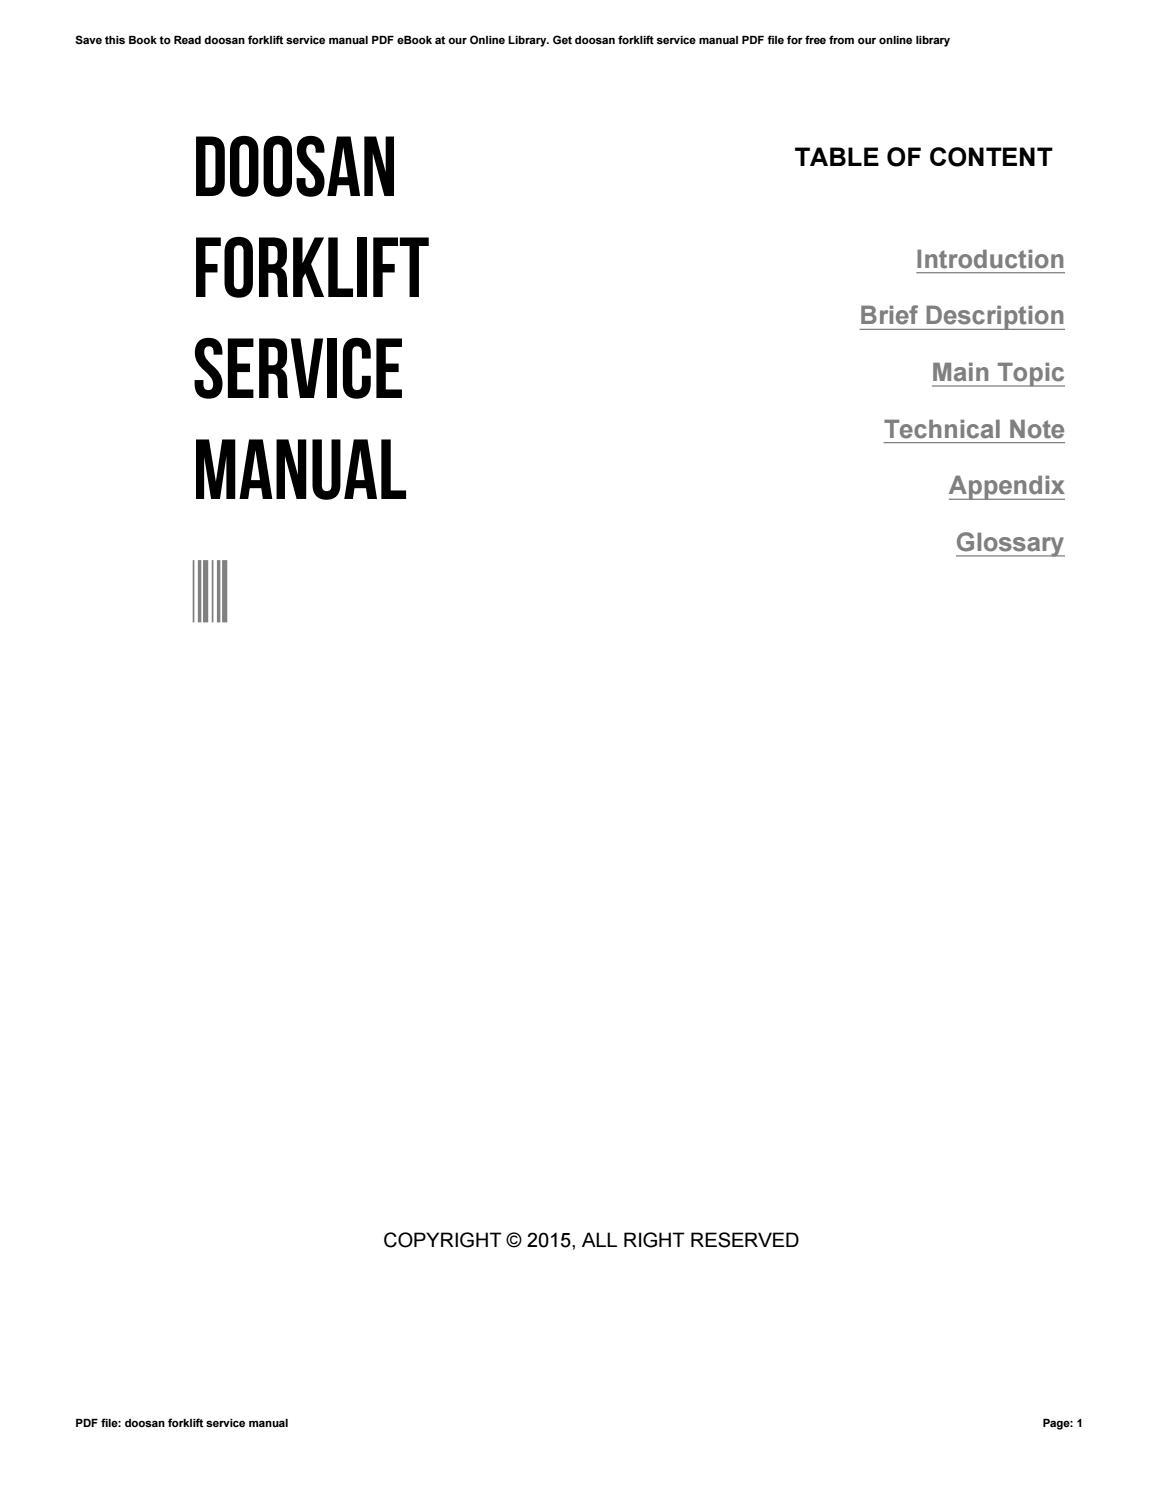 Doosan Forklift Service Manual By Cobin2hood02 Issuu Komatsu Fg25 Wiring Diagram